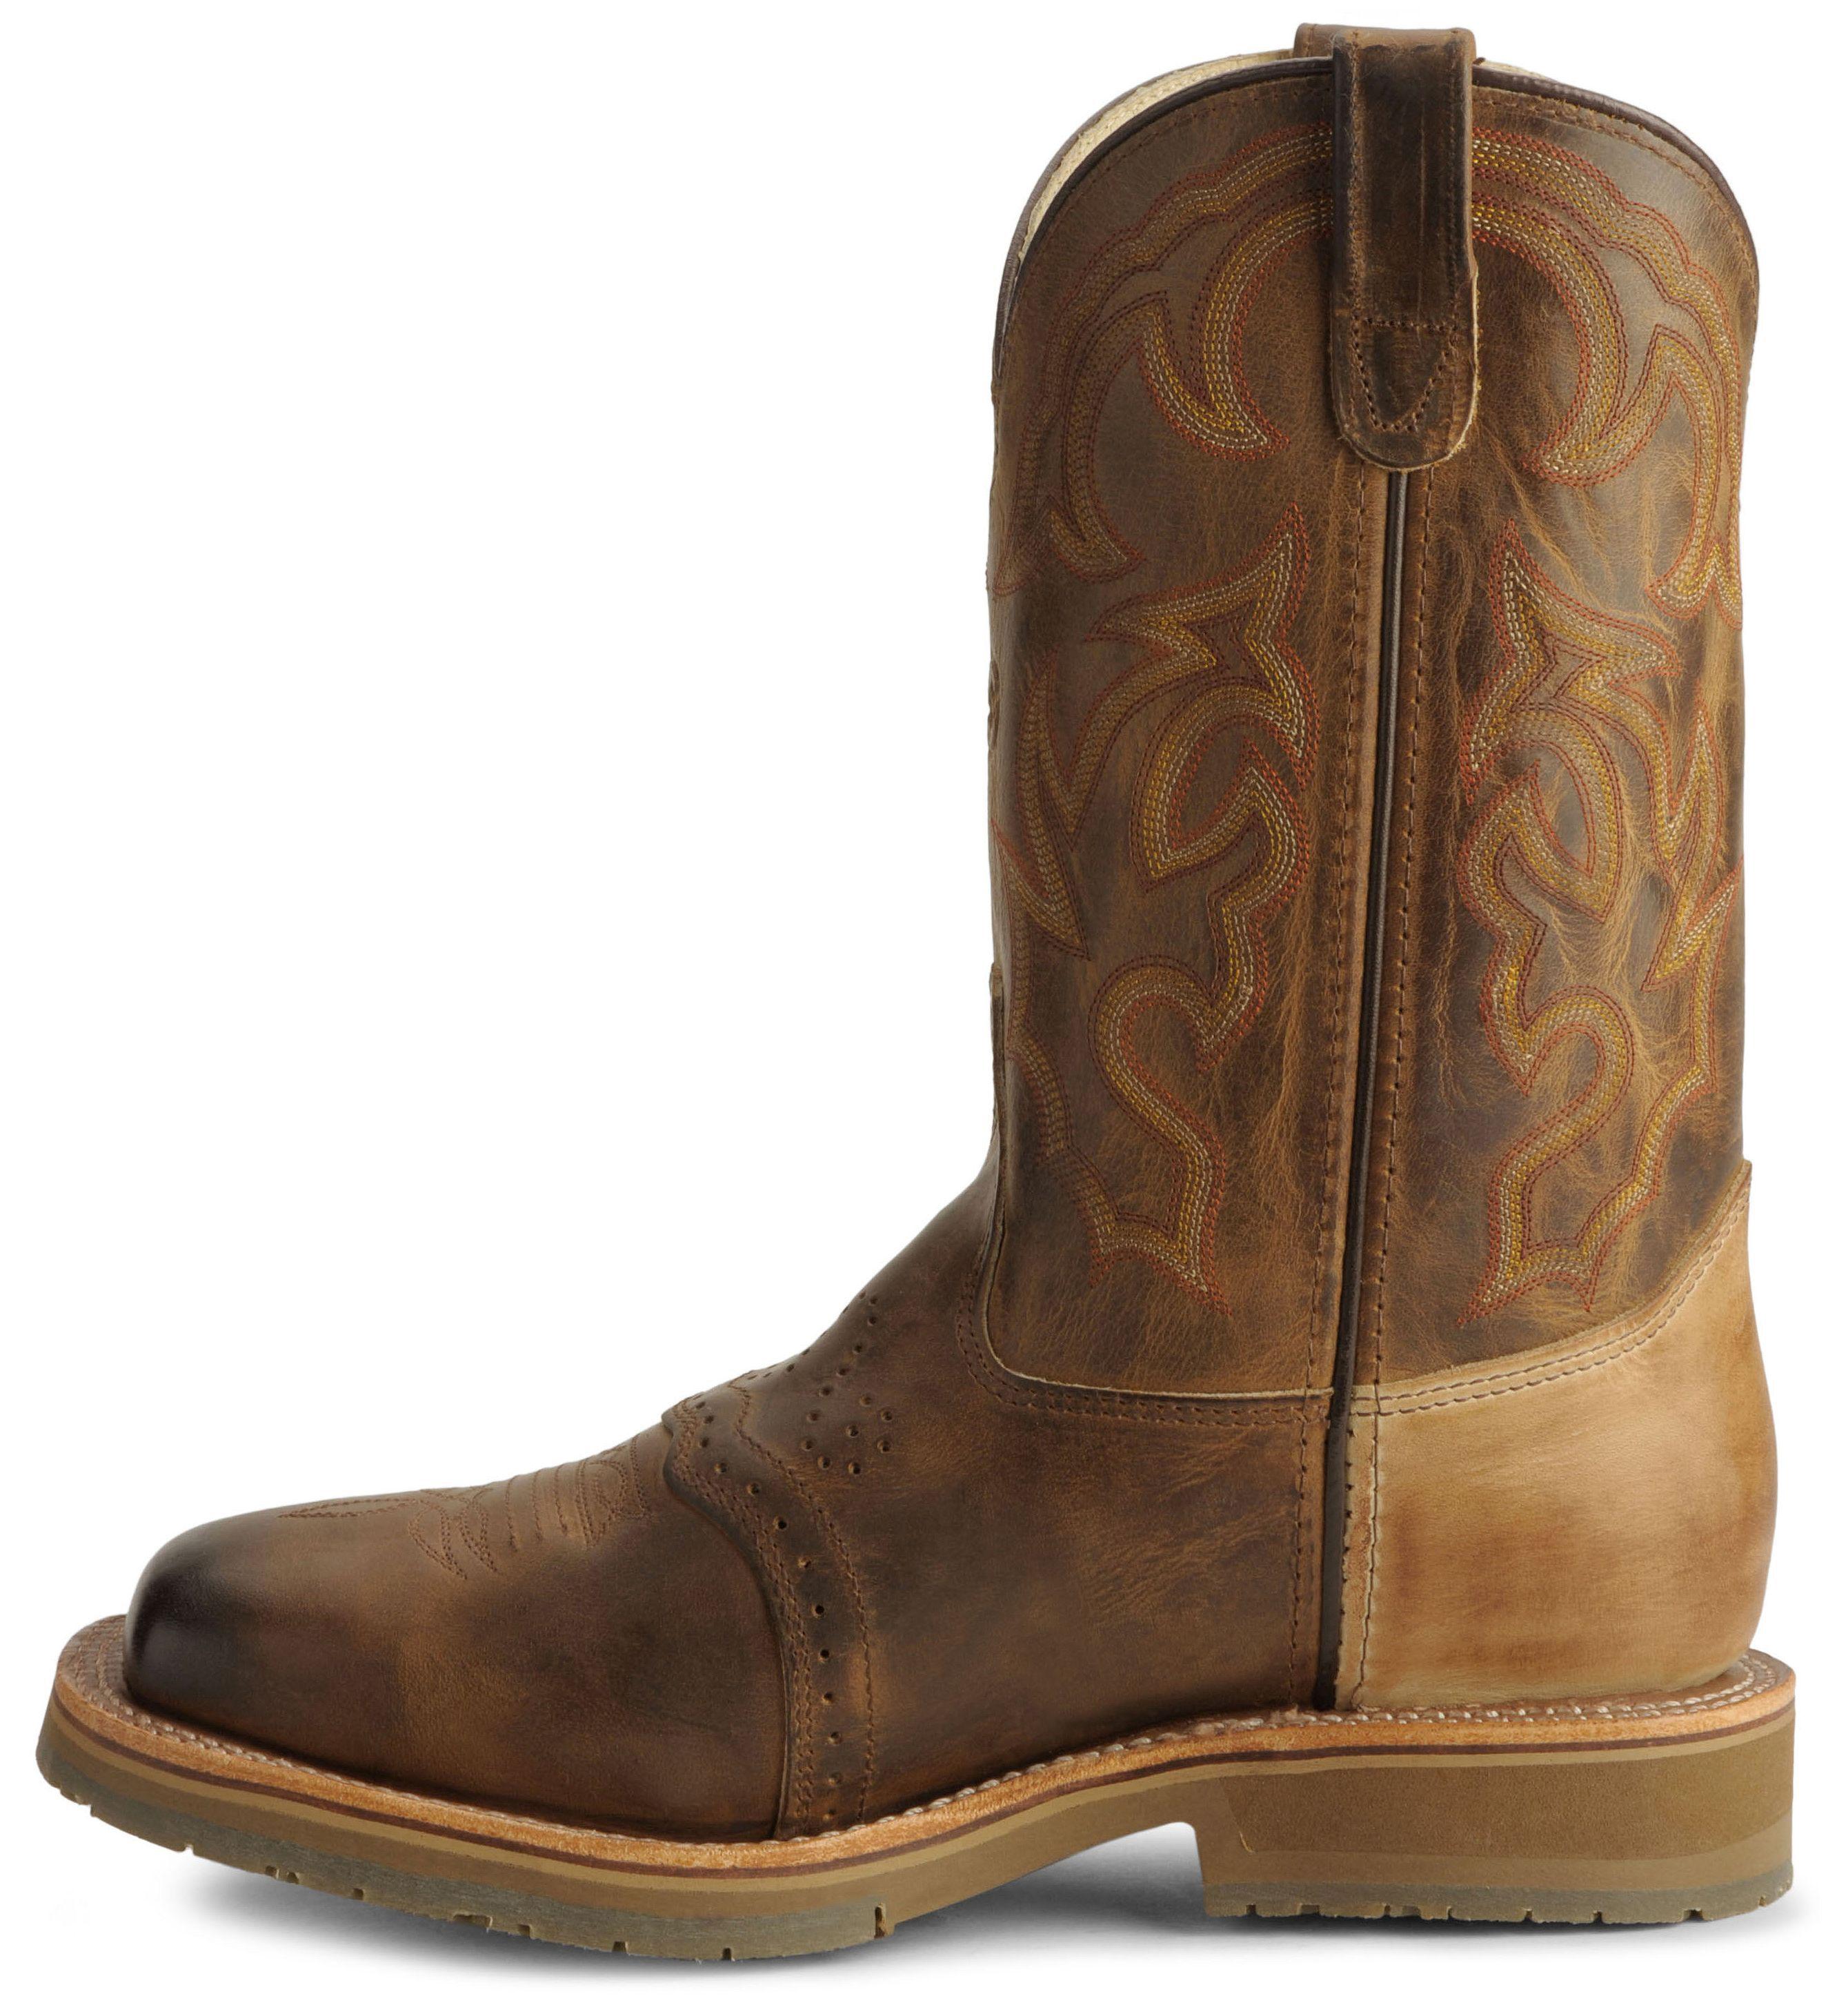 Ice Roper Cowboy Work Boots - Steel Toe